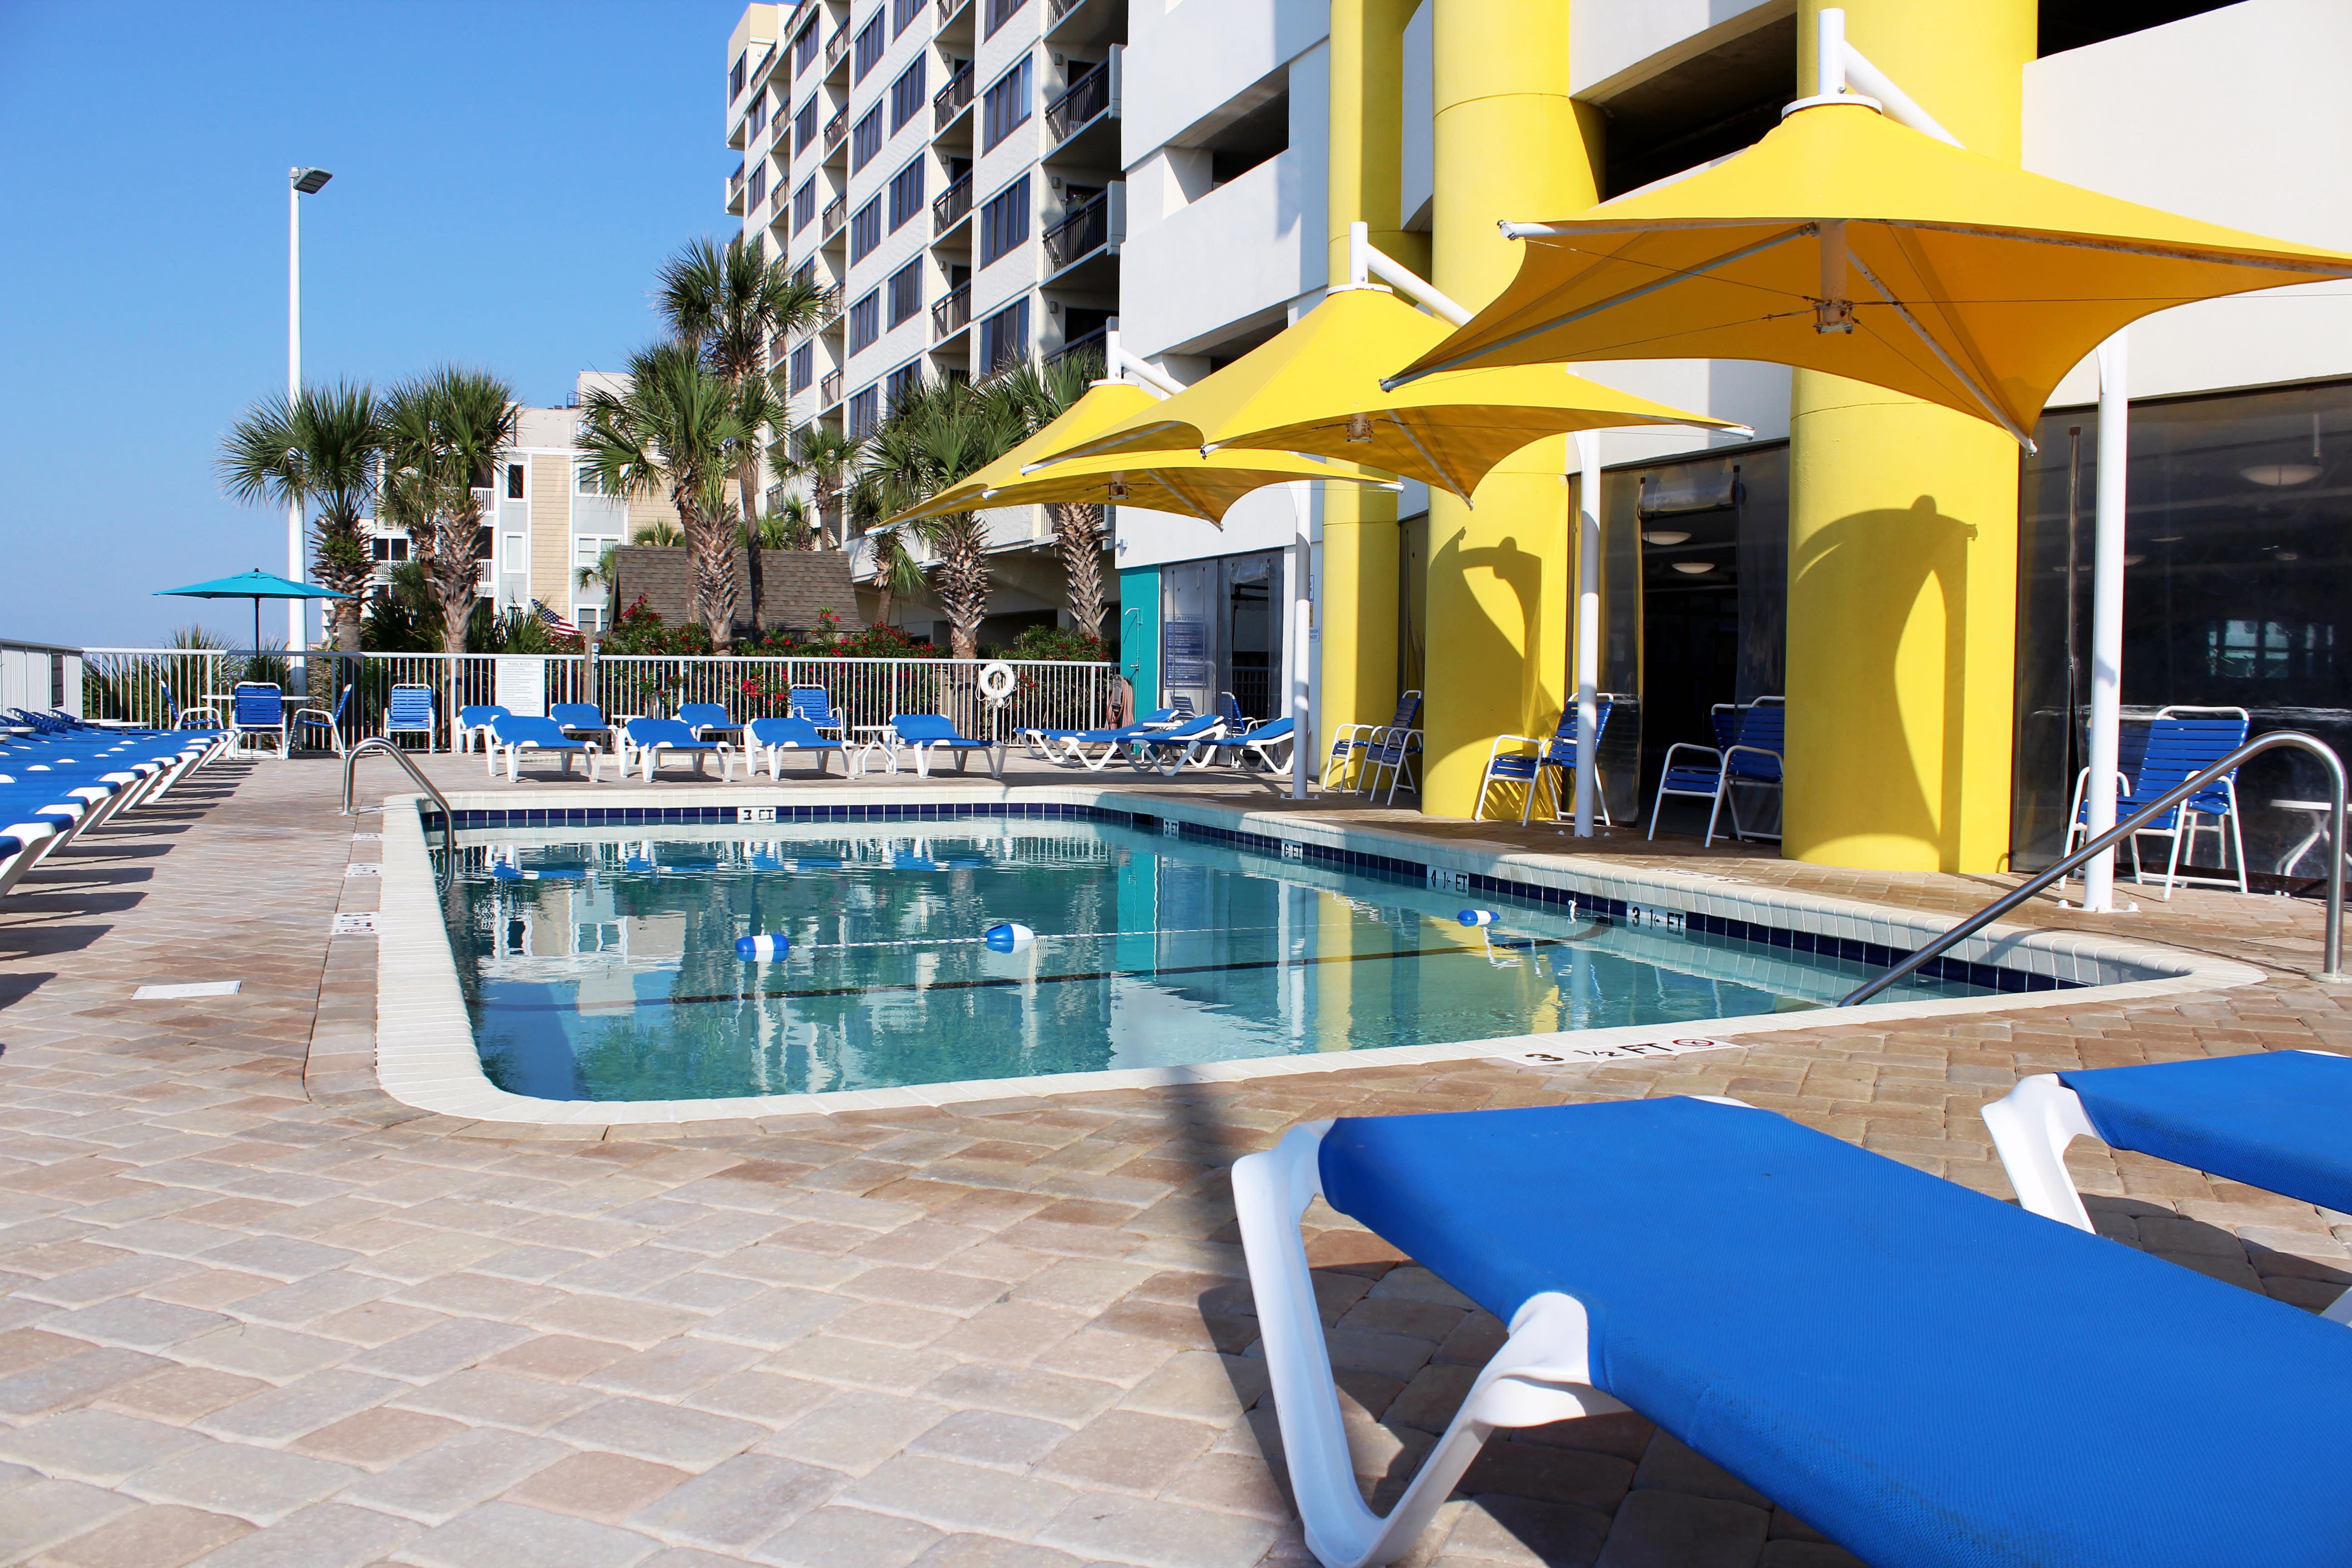 Seaside Resort - Save 25% Off + Free Perks!